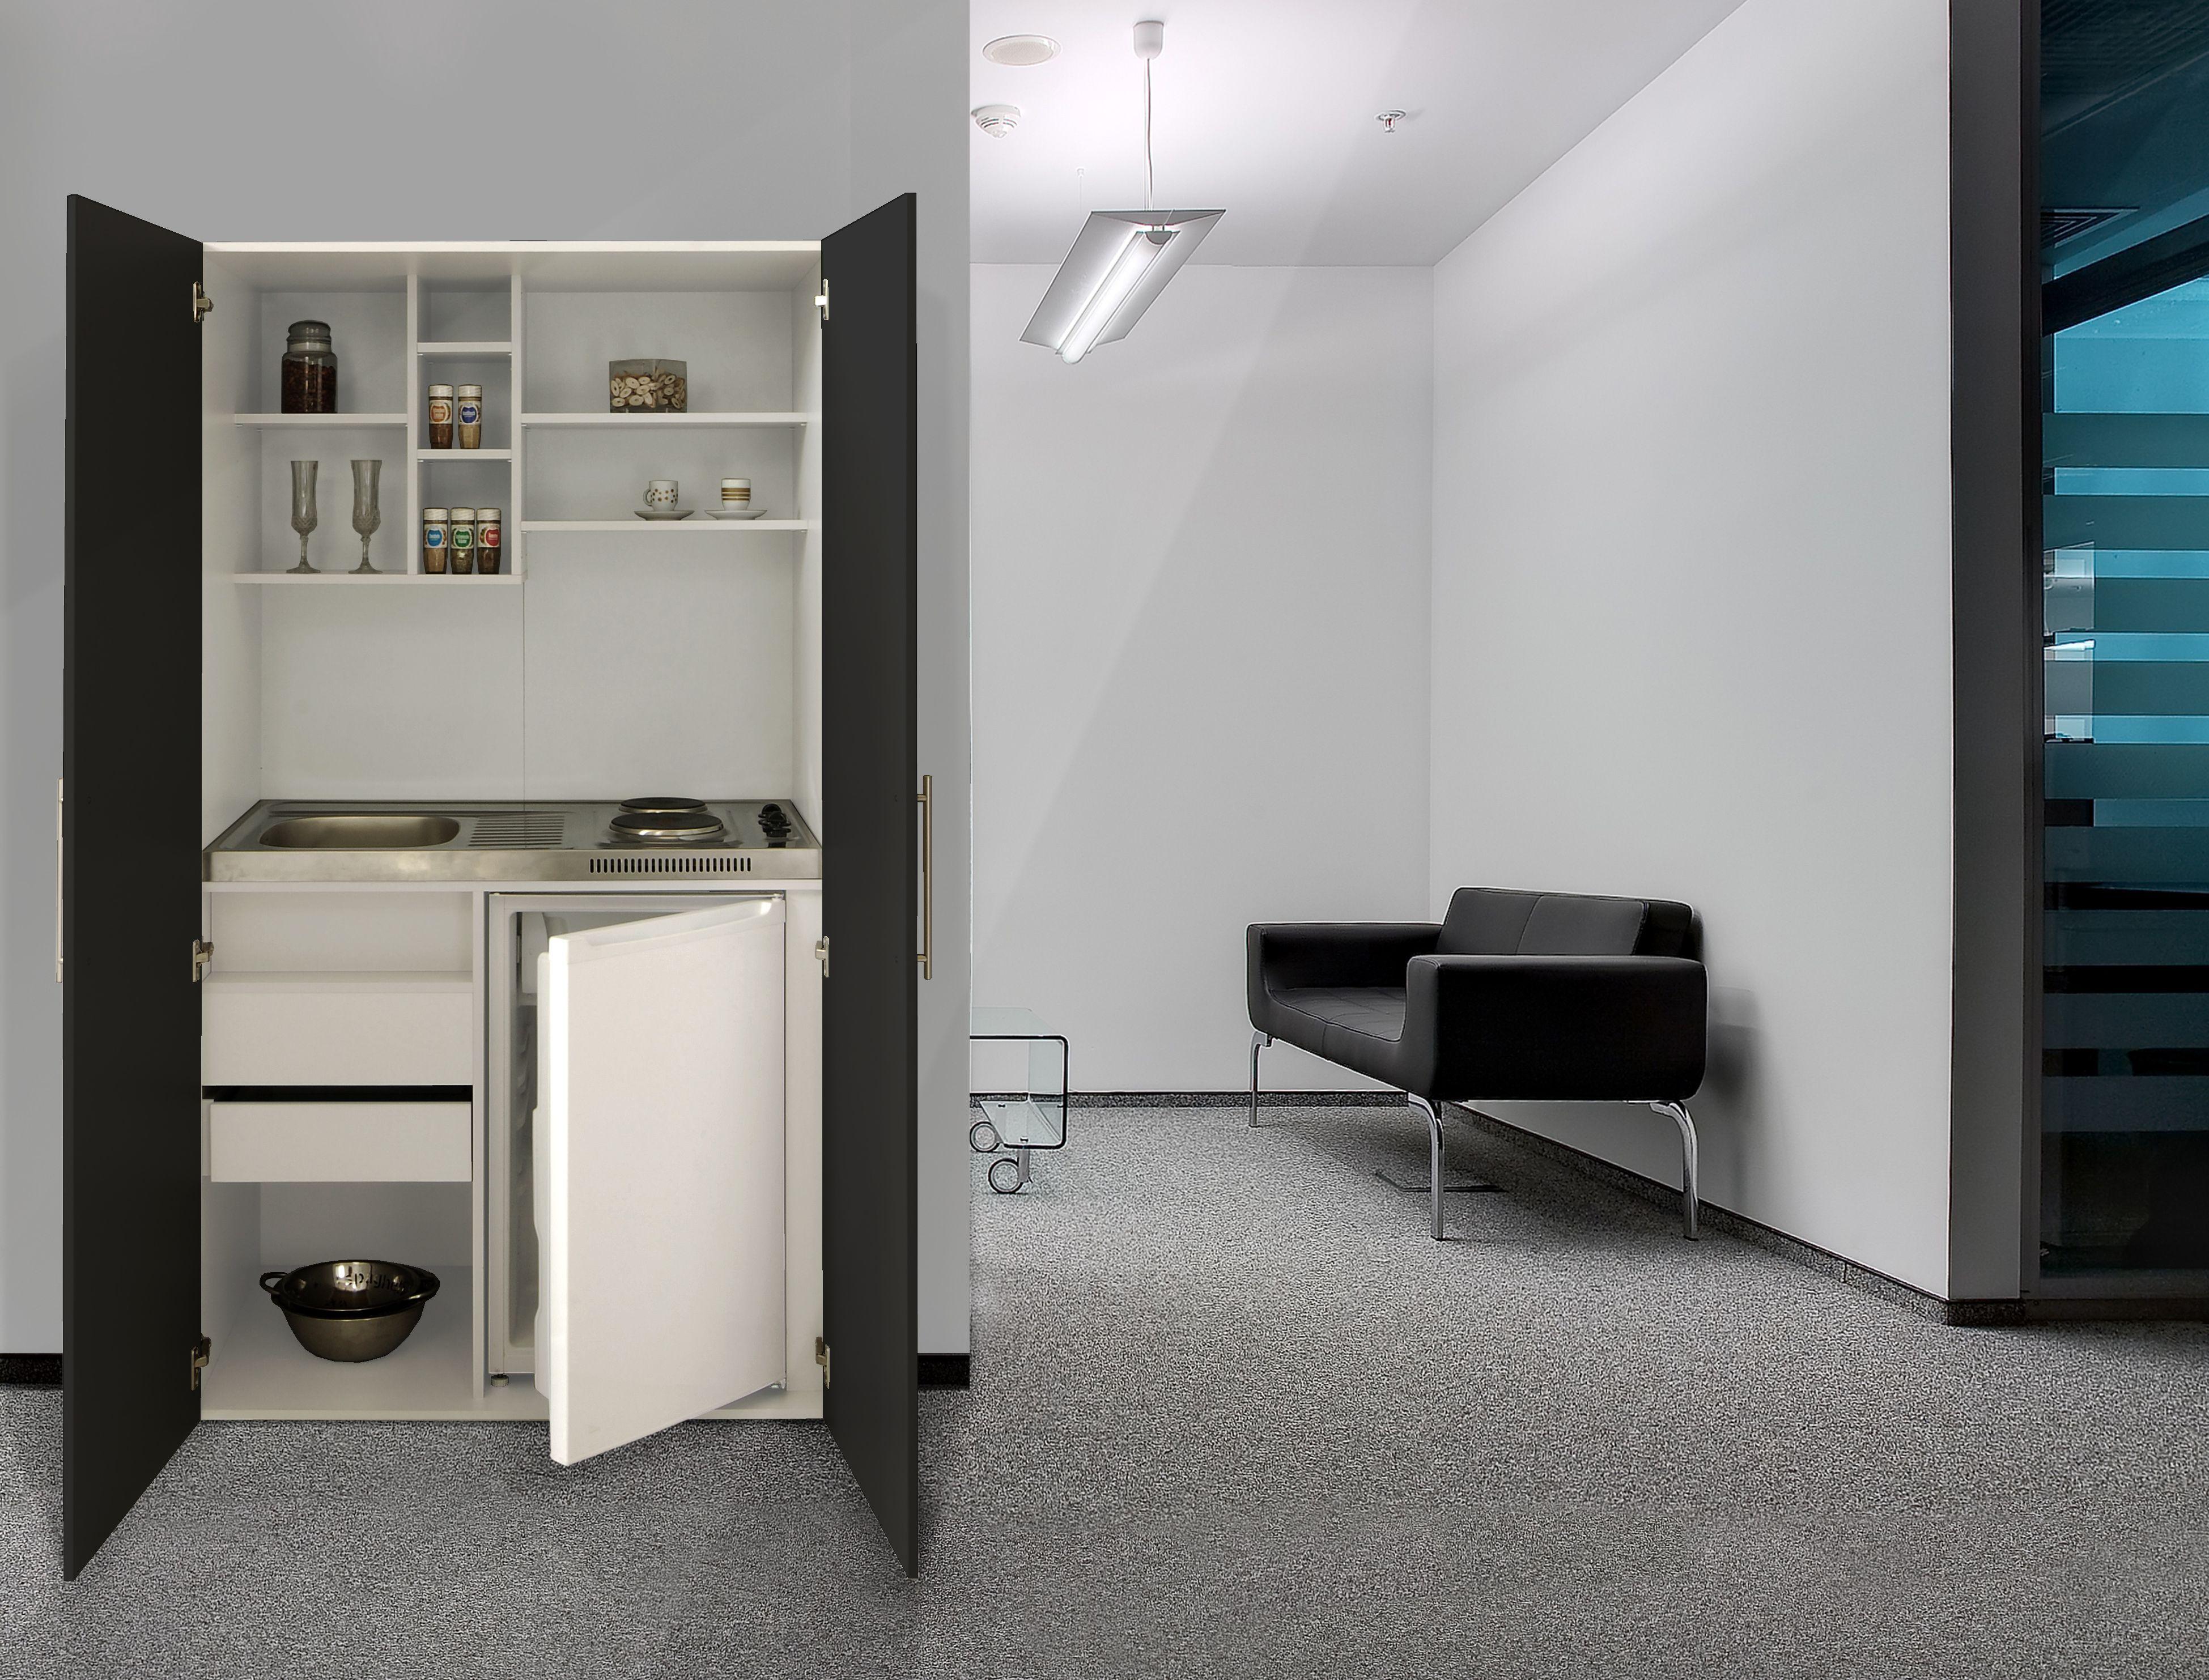 respekta single b rok che pantry k che minik che schrankk che weiss schwarz ebay. Black Bedroom Furniture Sets. Home Design Ideas